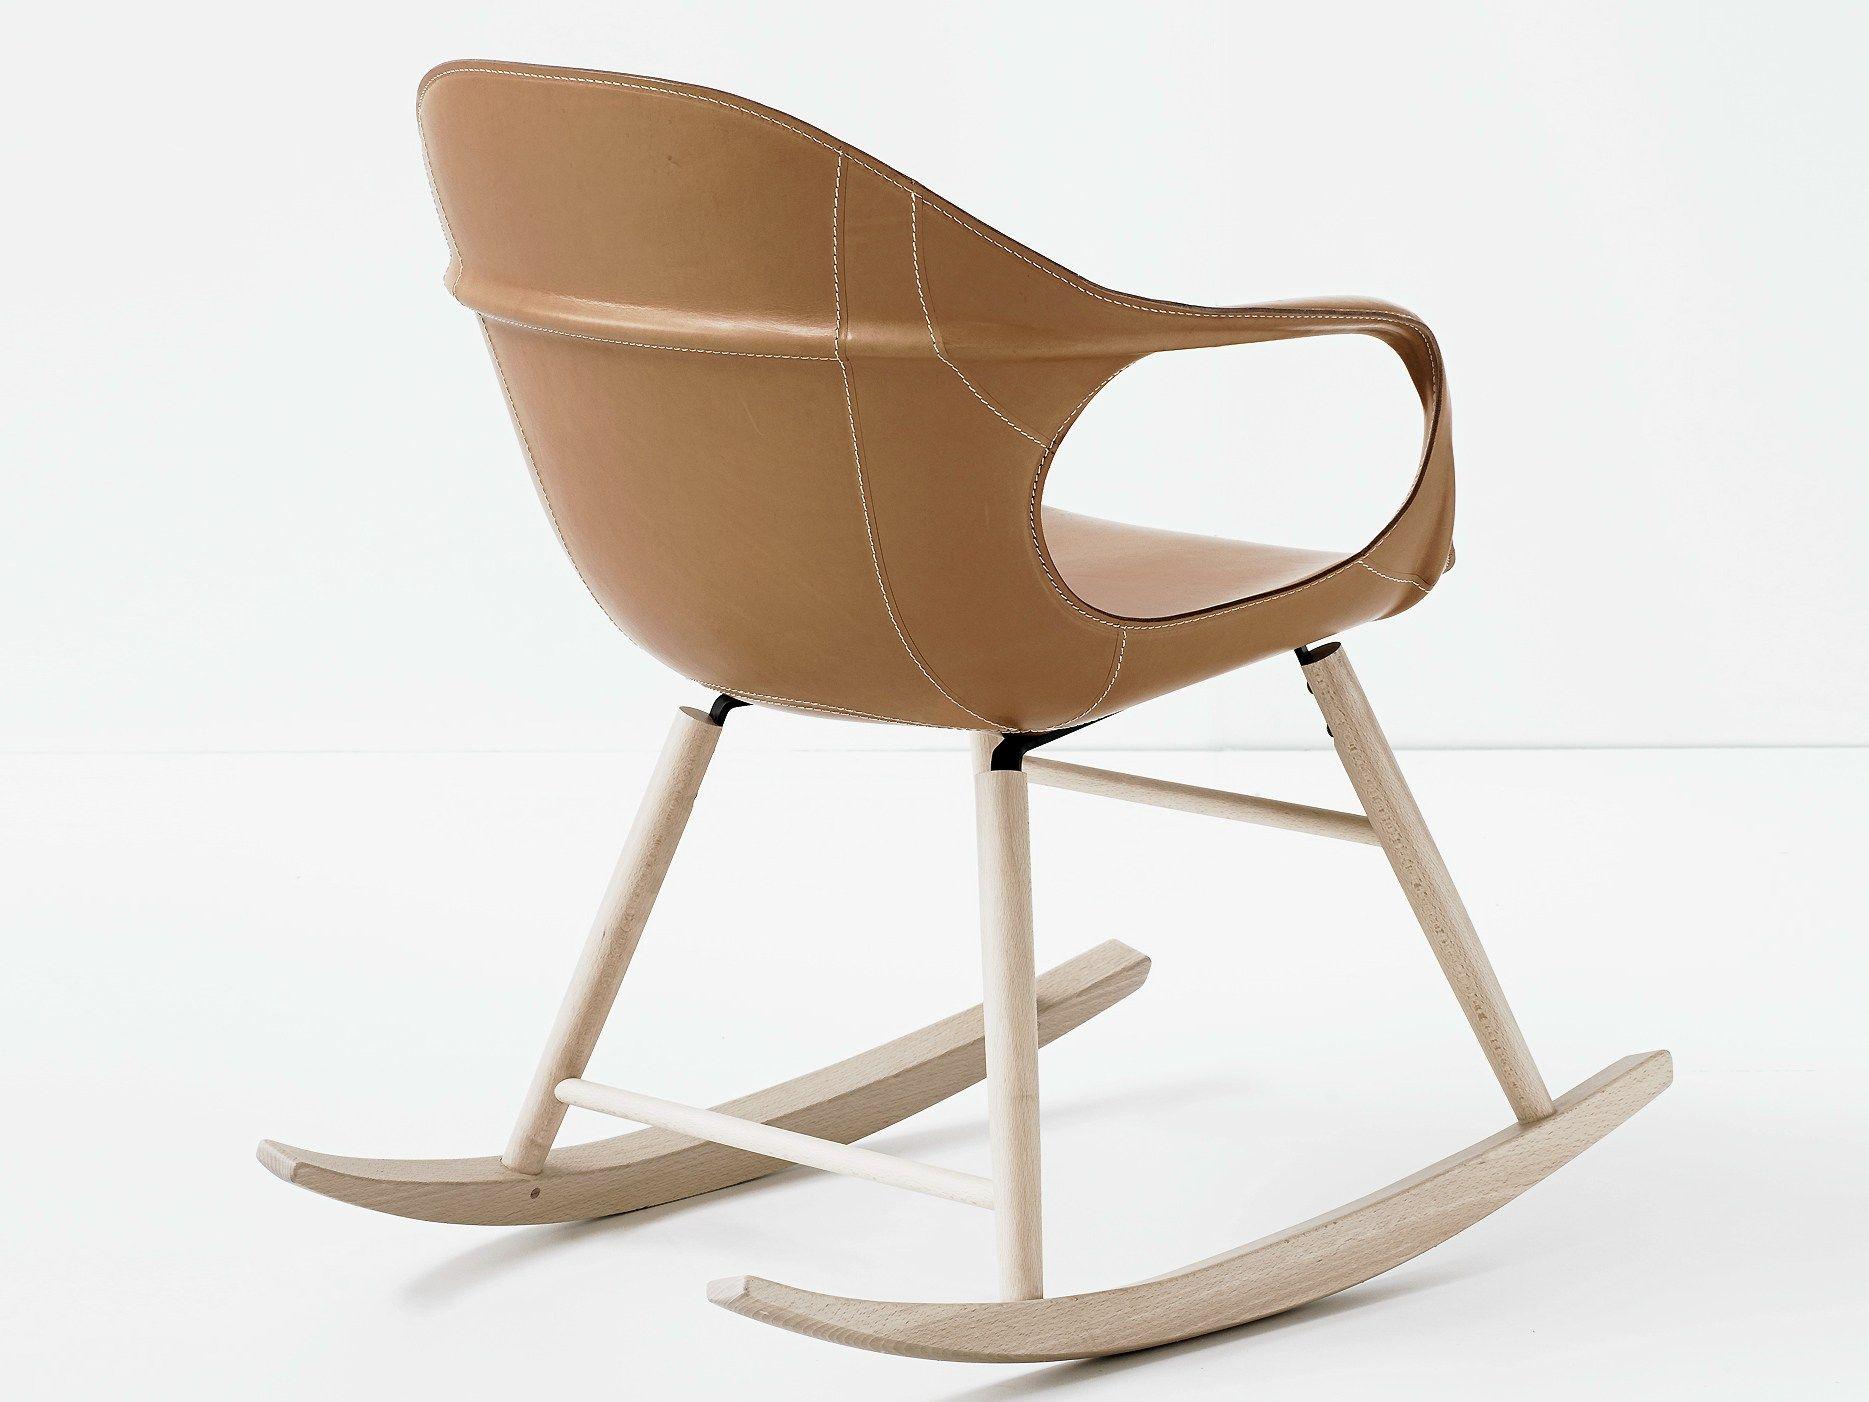 chaise bascule en cuir tann e elephant rocking by kristalia design neuland industriaedesign. Black Bedroom Furniture Sets. Home Design Ideas